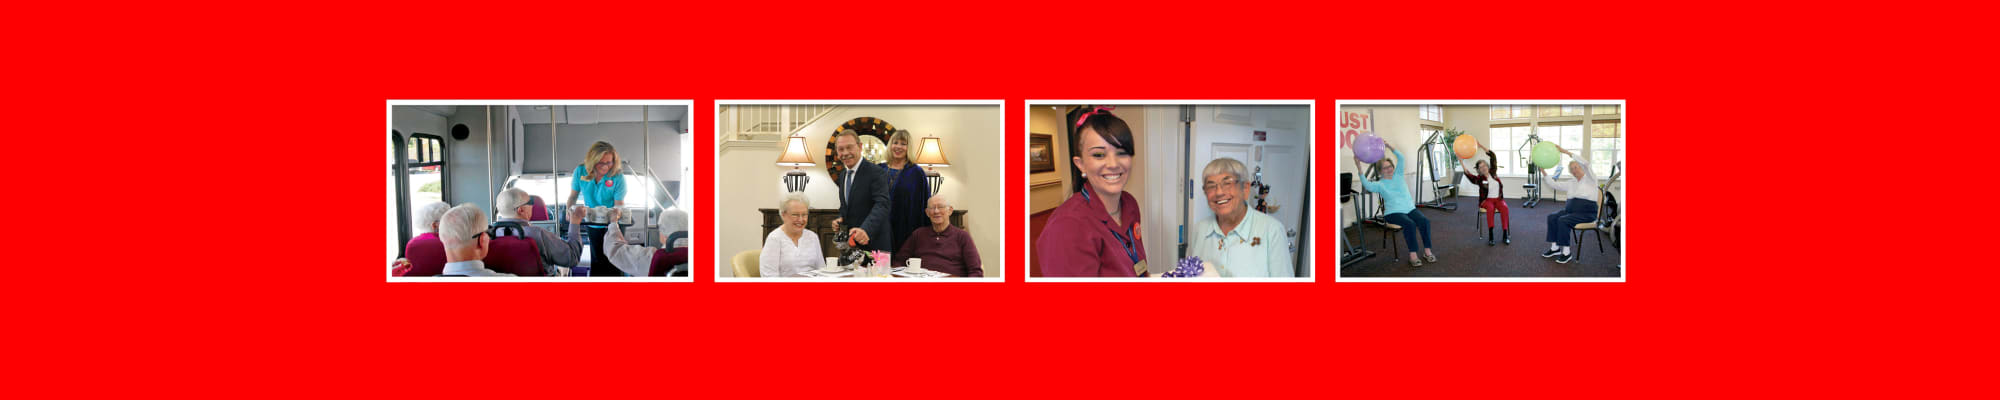 Amenities at Capitol Ridge Gracious Retirement Living in Bristow, Virginia